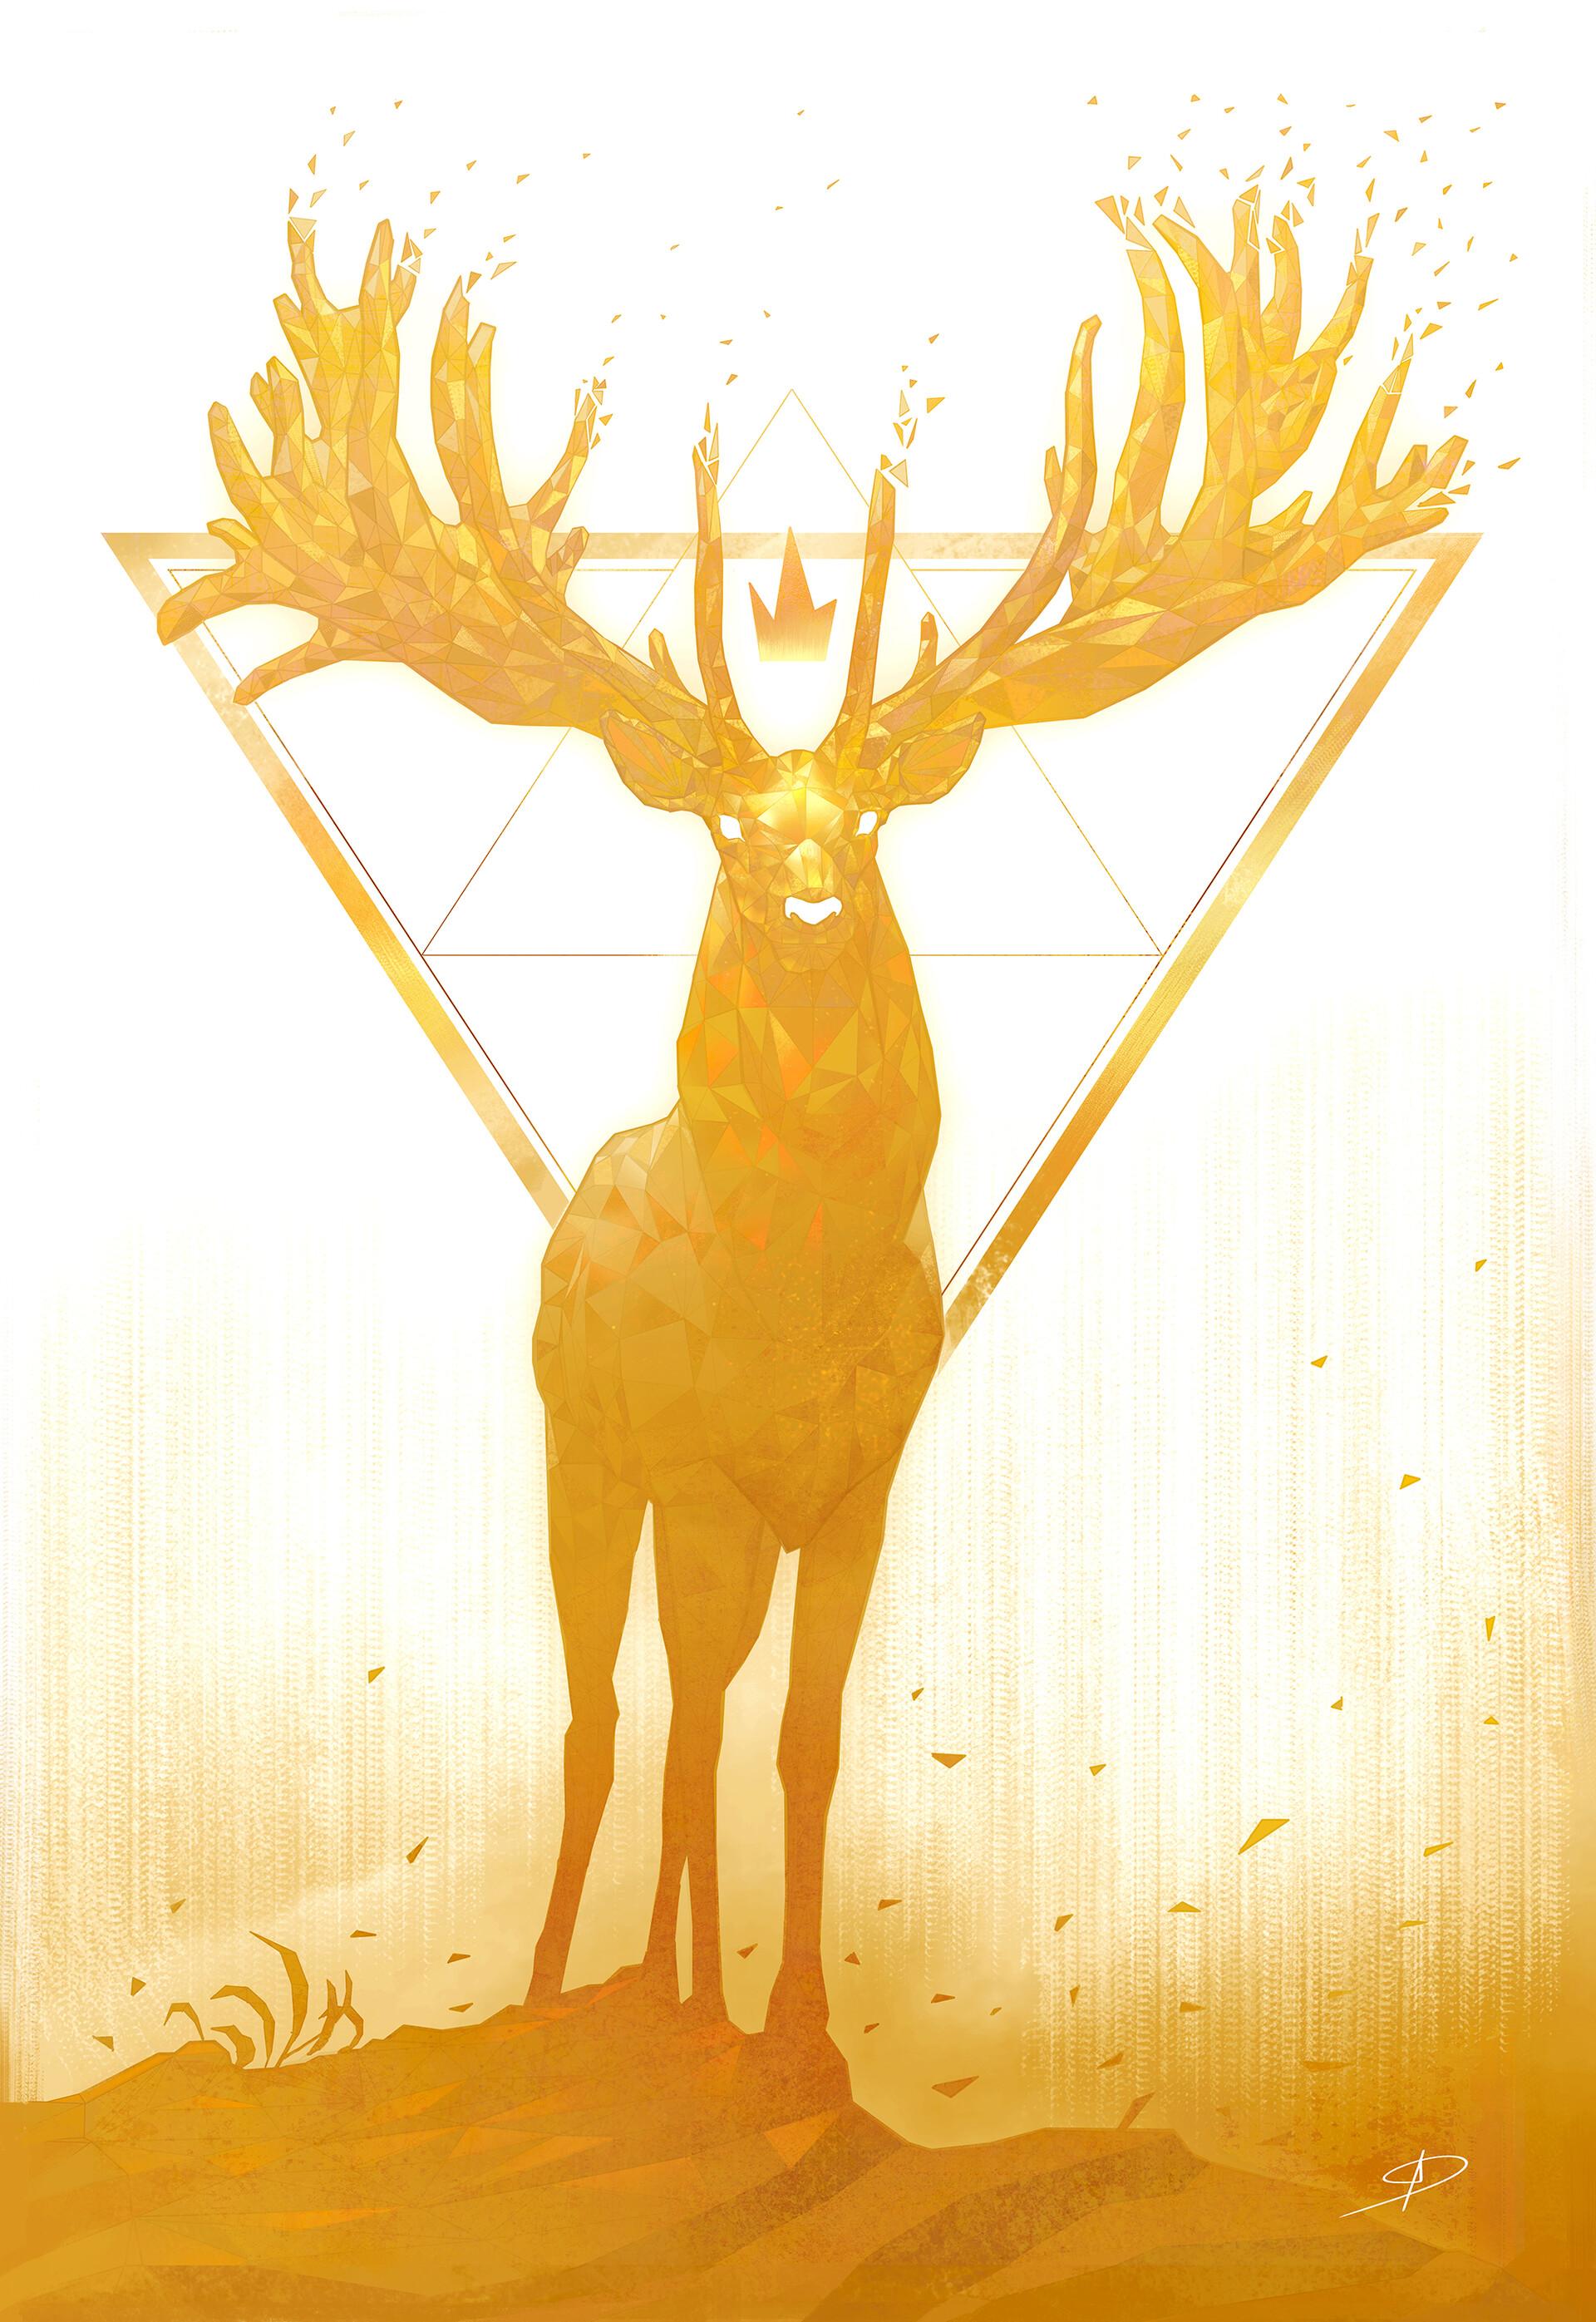 David alvarez dalvarez forest spirit